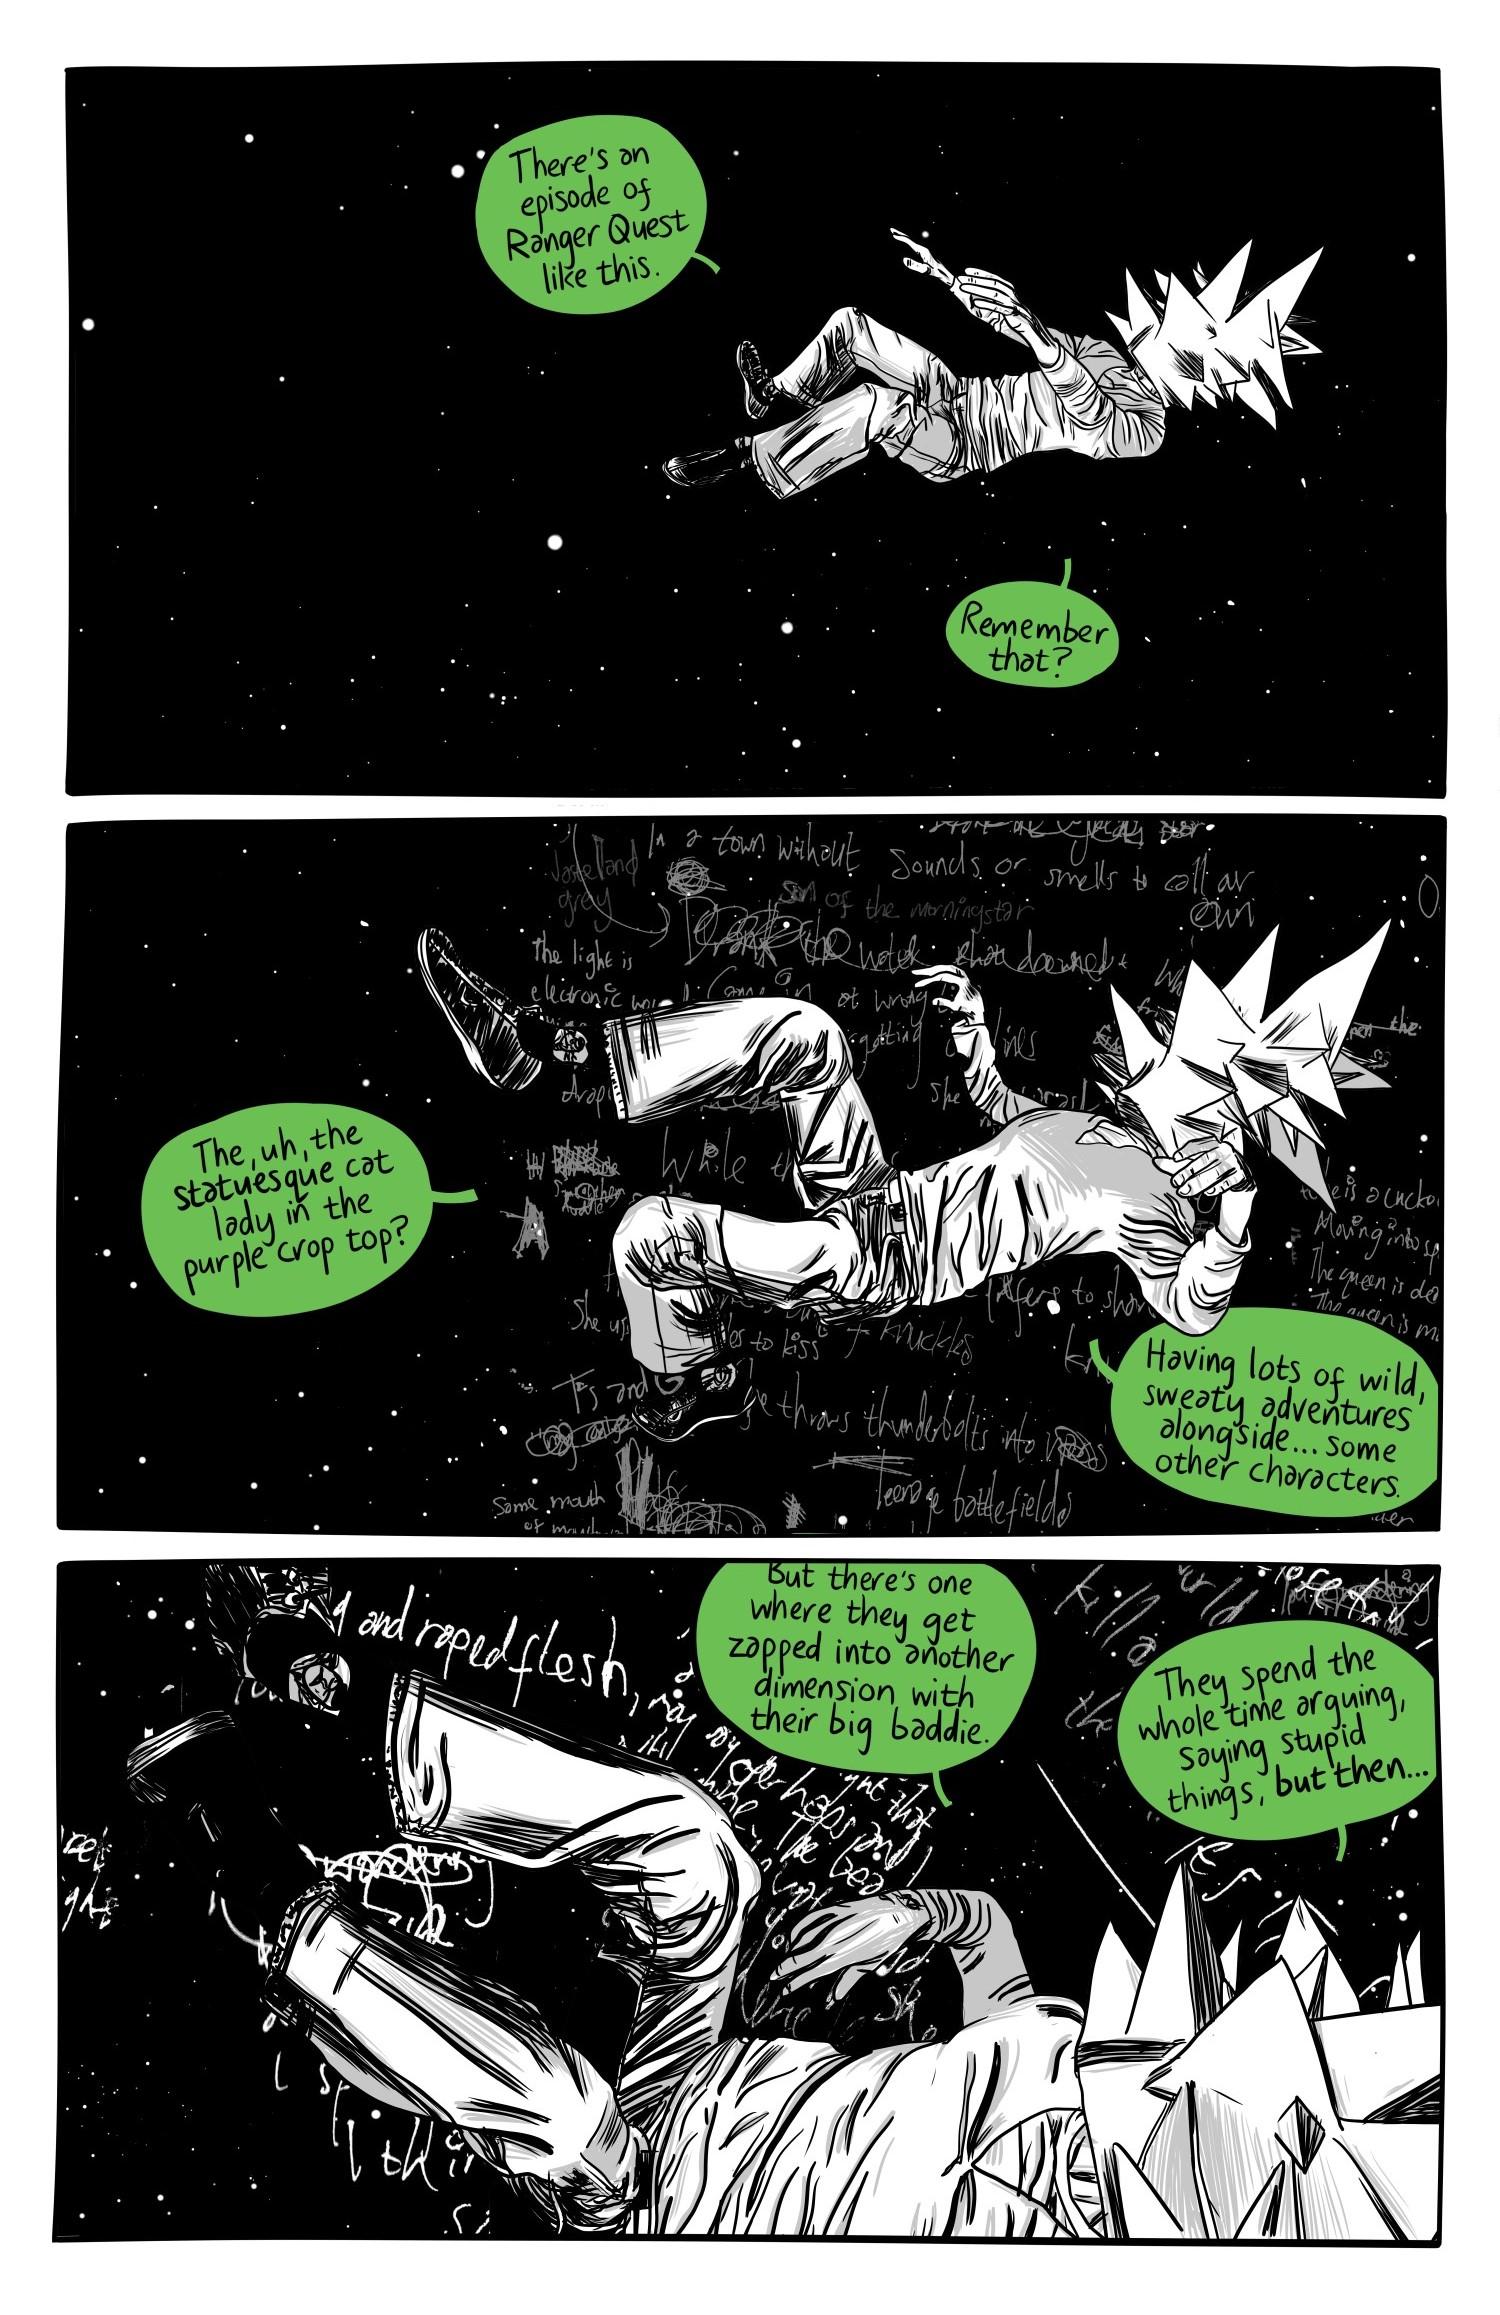 Page57.jpg